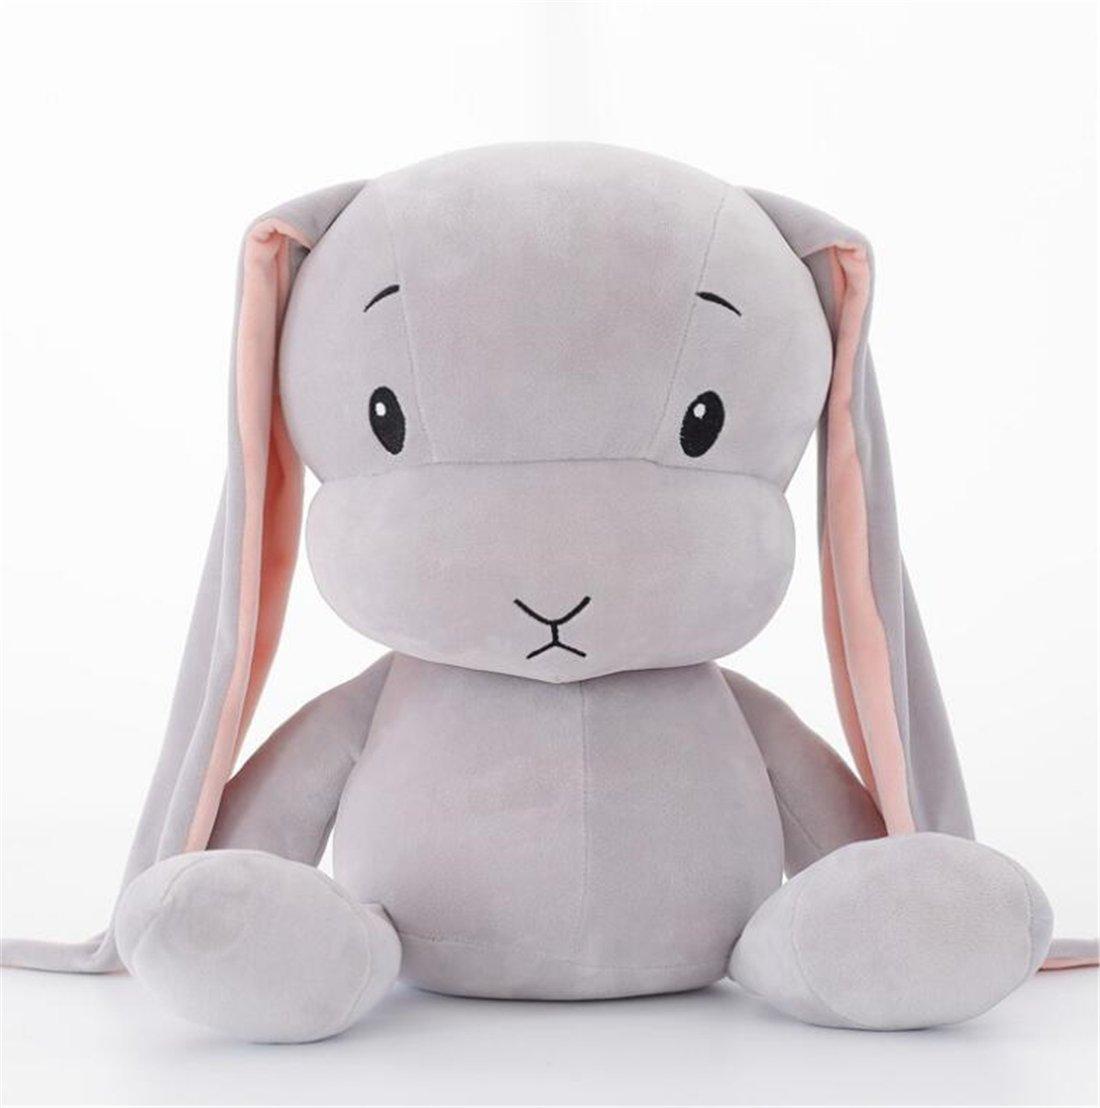 Tmrow 1pc Cute Rabbit Stuffed Plush Animal Toy Soft Doll Cushion Pillow Pet for Kids Gift Gray